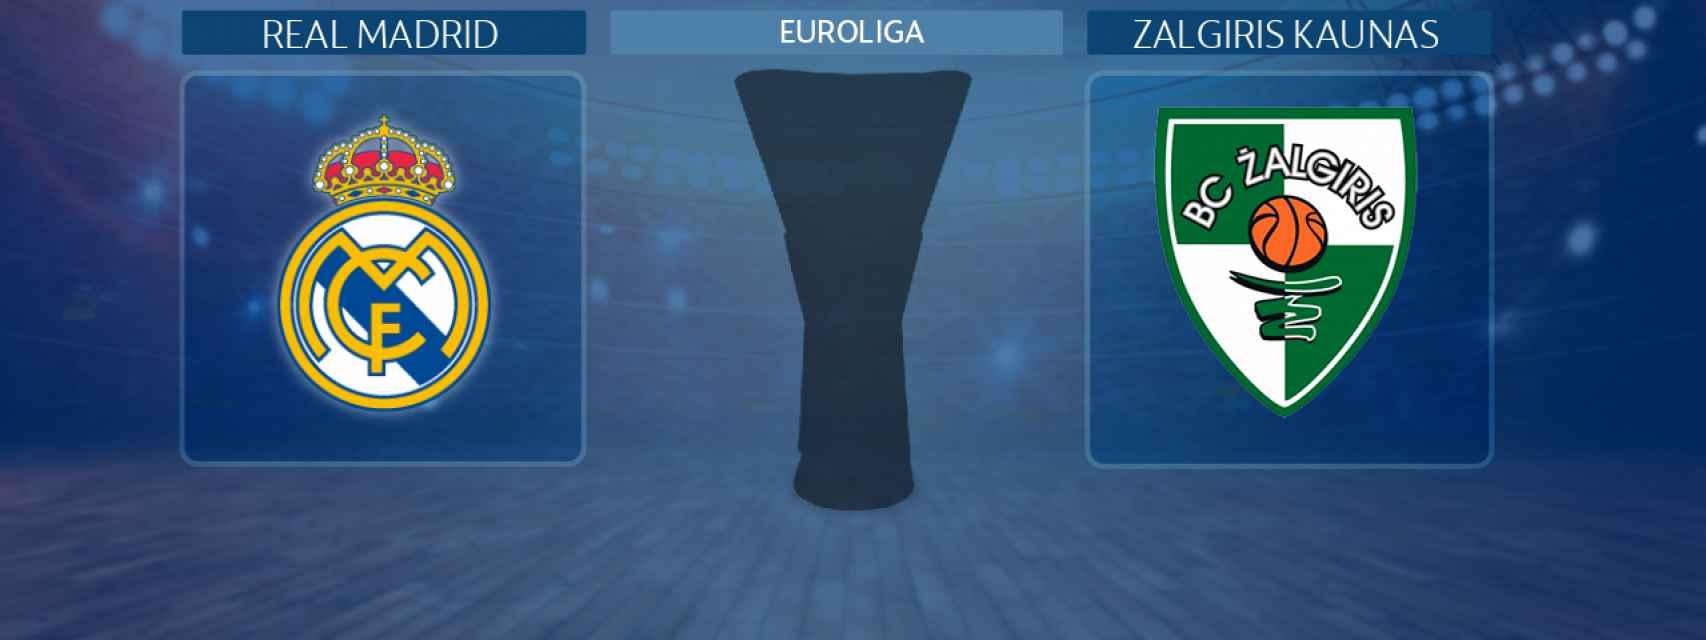 Real Madrid - Zalgiris Kaunasm partido de la Euroliga